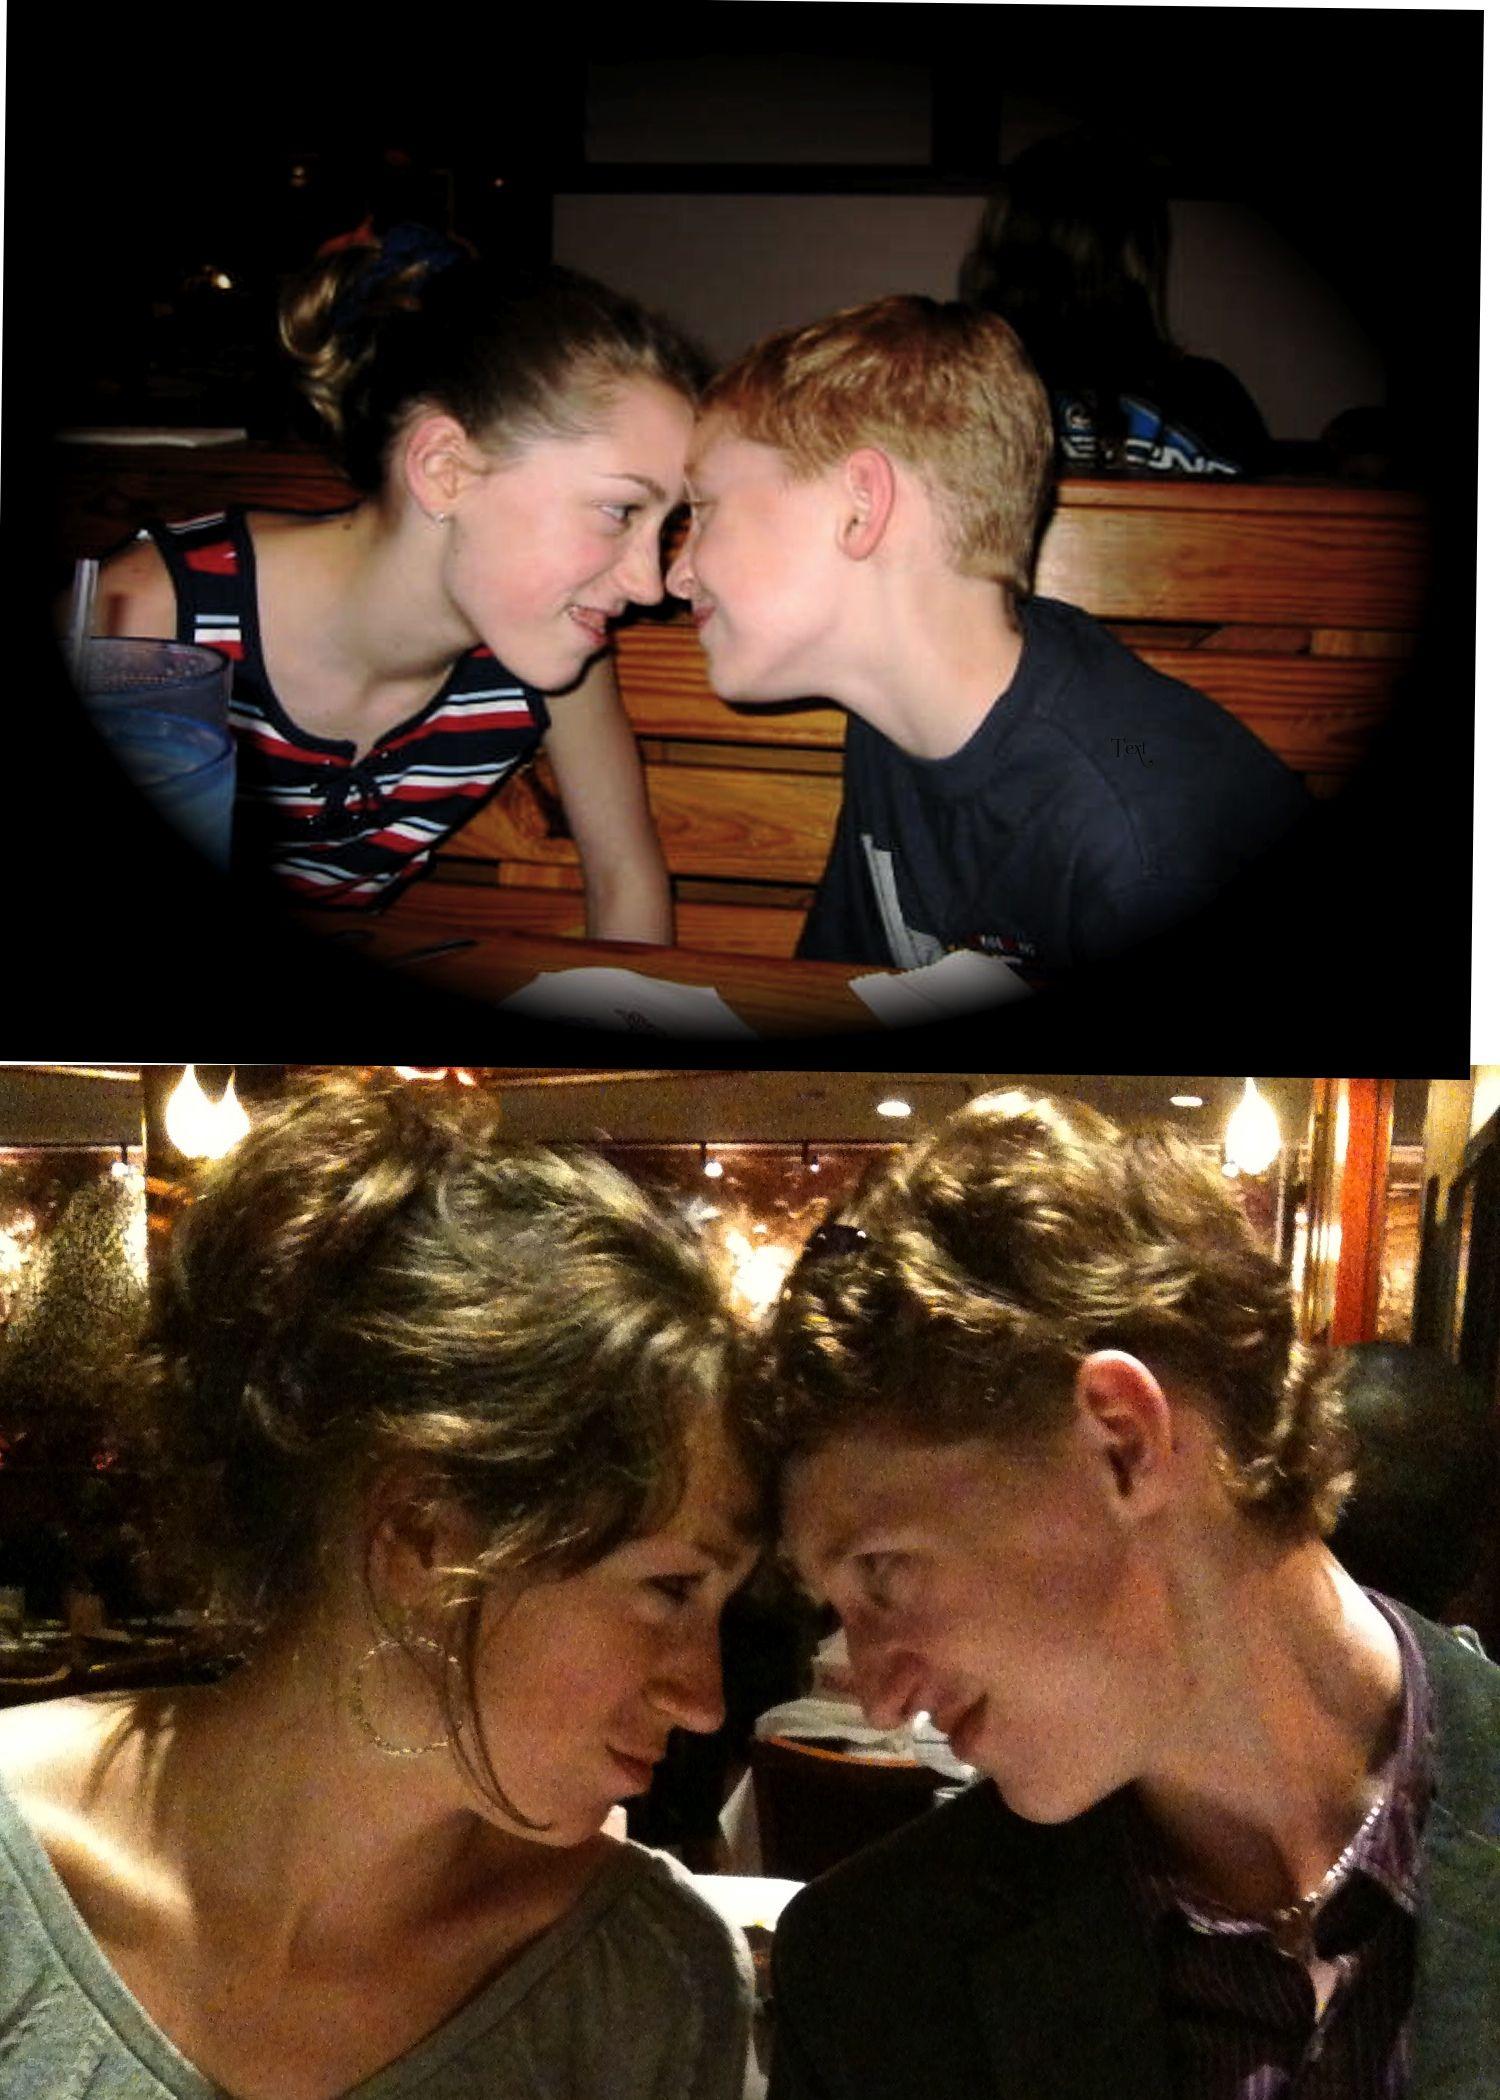 sibling 4 years apart relationship